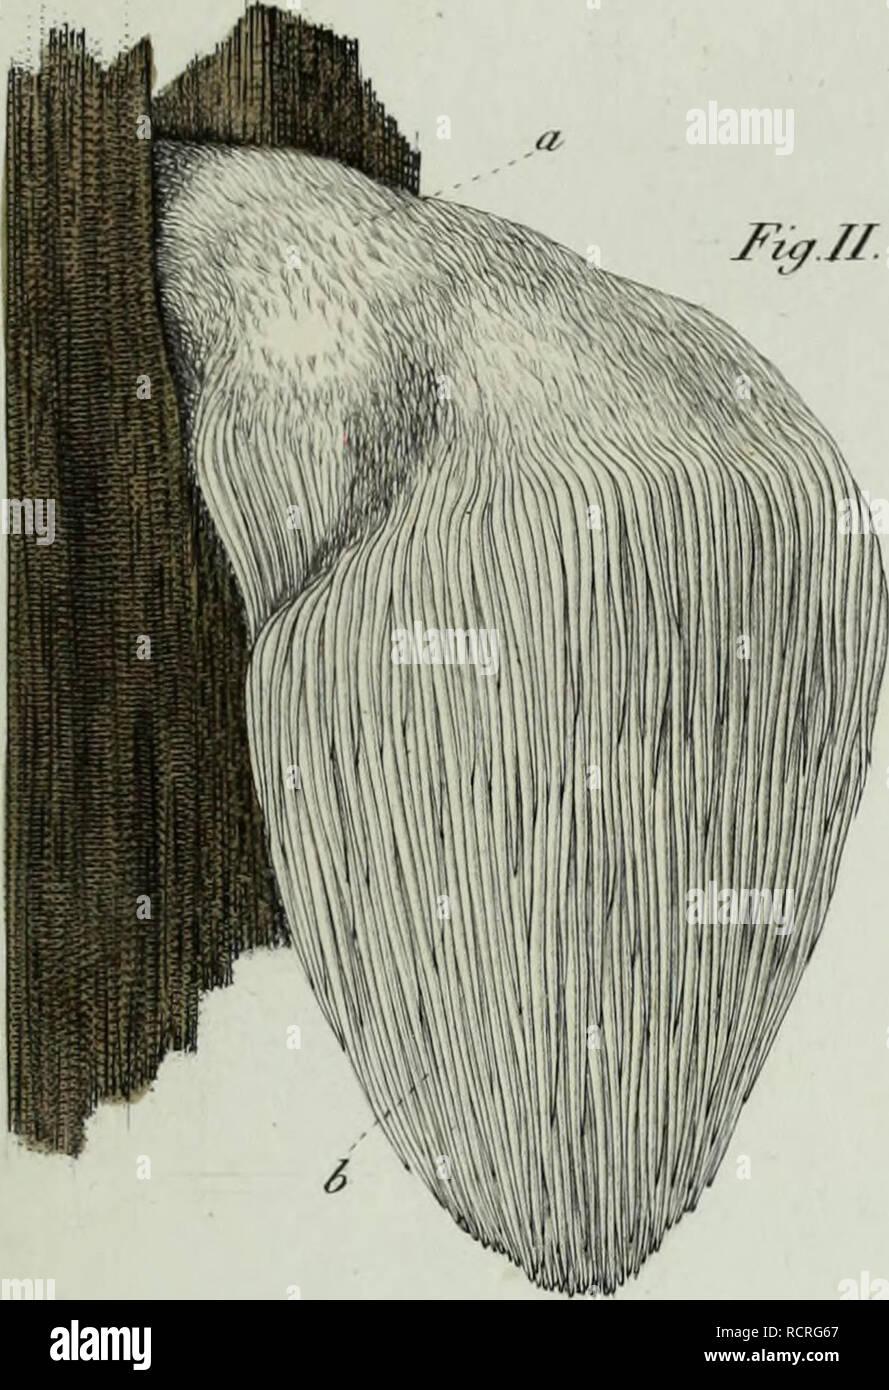 . Descrizione dei funghi mangerecci più comuni dell'Italia e de' velenosi che possono co' medesimi confondersi. Fungi; Mushrooms. Tjtxvz.. Please note that these images are extracted from scanned page images that may have been digitally enhanced for readability - coloration and appearance of these illustrations may not perfectly resemble the original work.. Vittadini, Carlo; Cavagna Sangiuliani di Gualdana, Antonio, conte, 1843-1913, former owner. IU-R. Milano, Rusconi - Stock Image